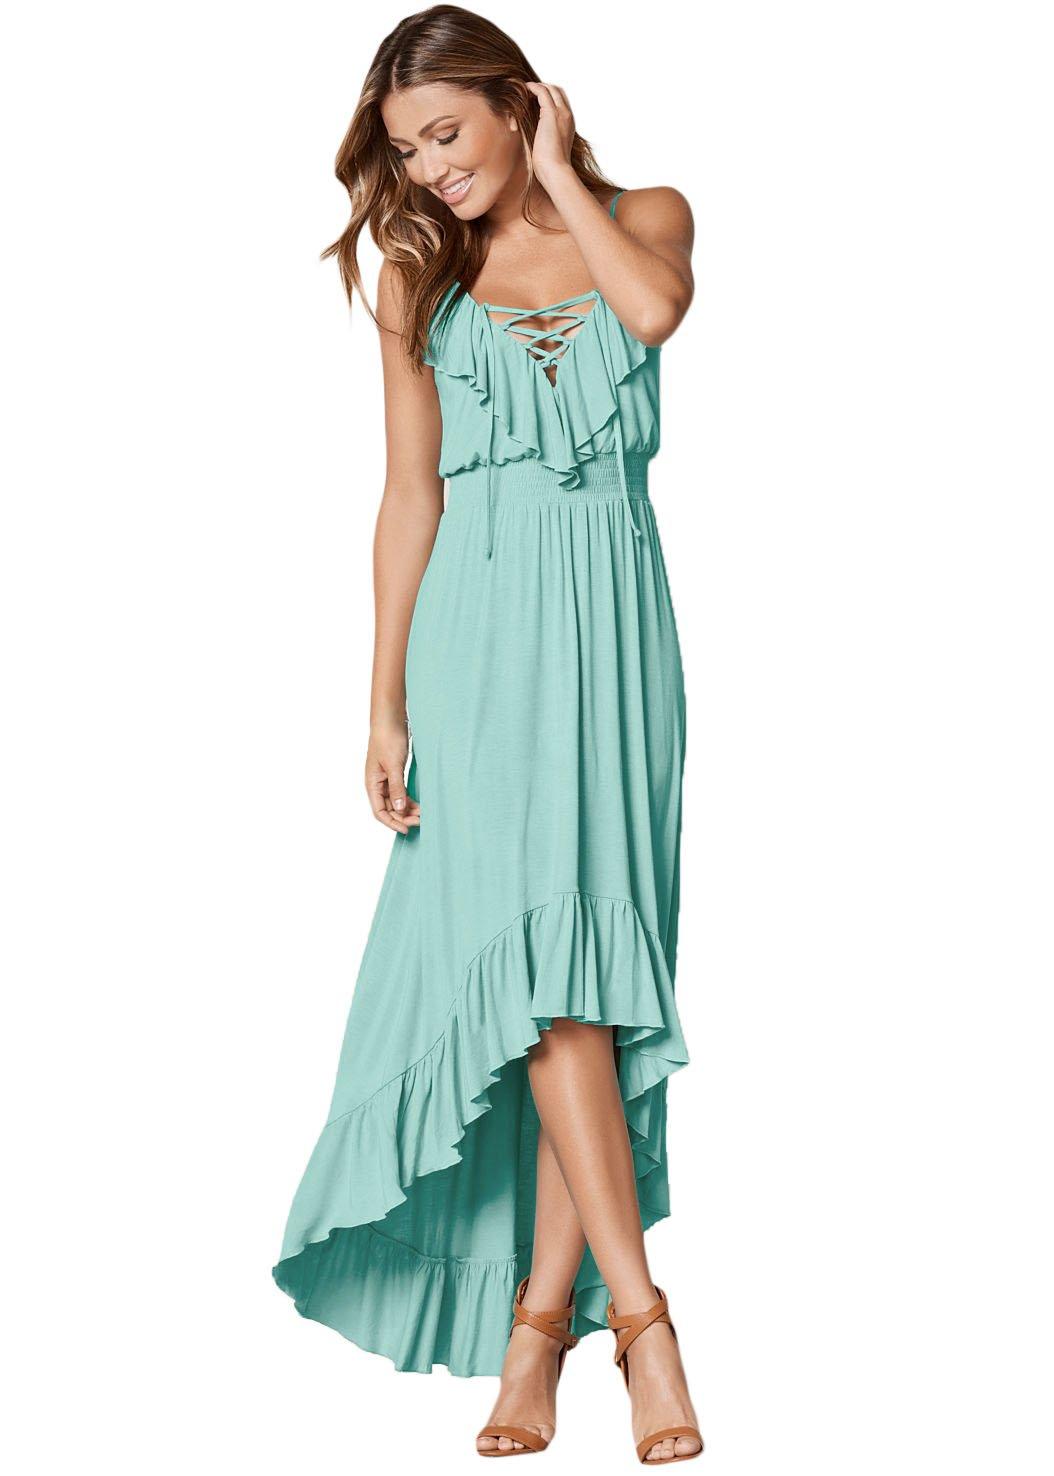 Mint Green Lace Up V Neck Ruffle Trim Hi-low Maxi Dress